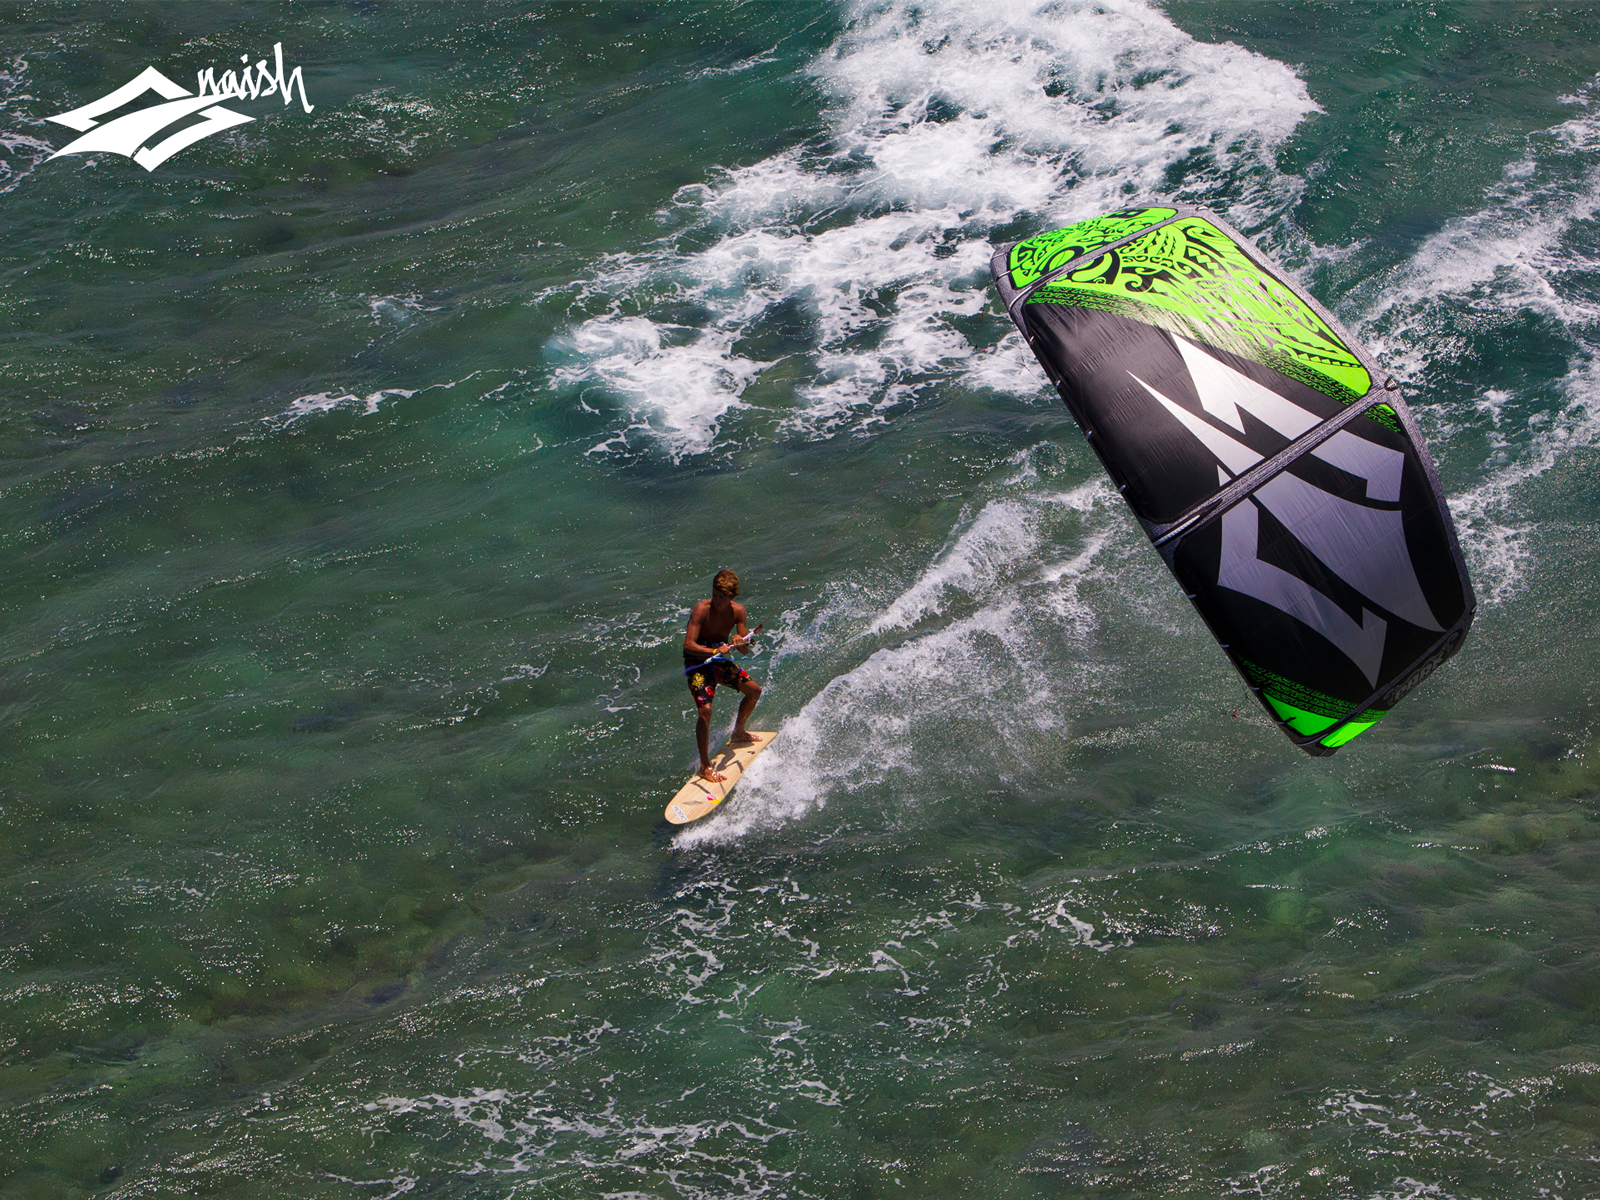 kitesurf wallpaper image - Kai Lenny cruising with the Naish Park kite and Alaia kiteboard off Hawaii - in resolution: Standard 4:3 1600 X 1200